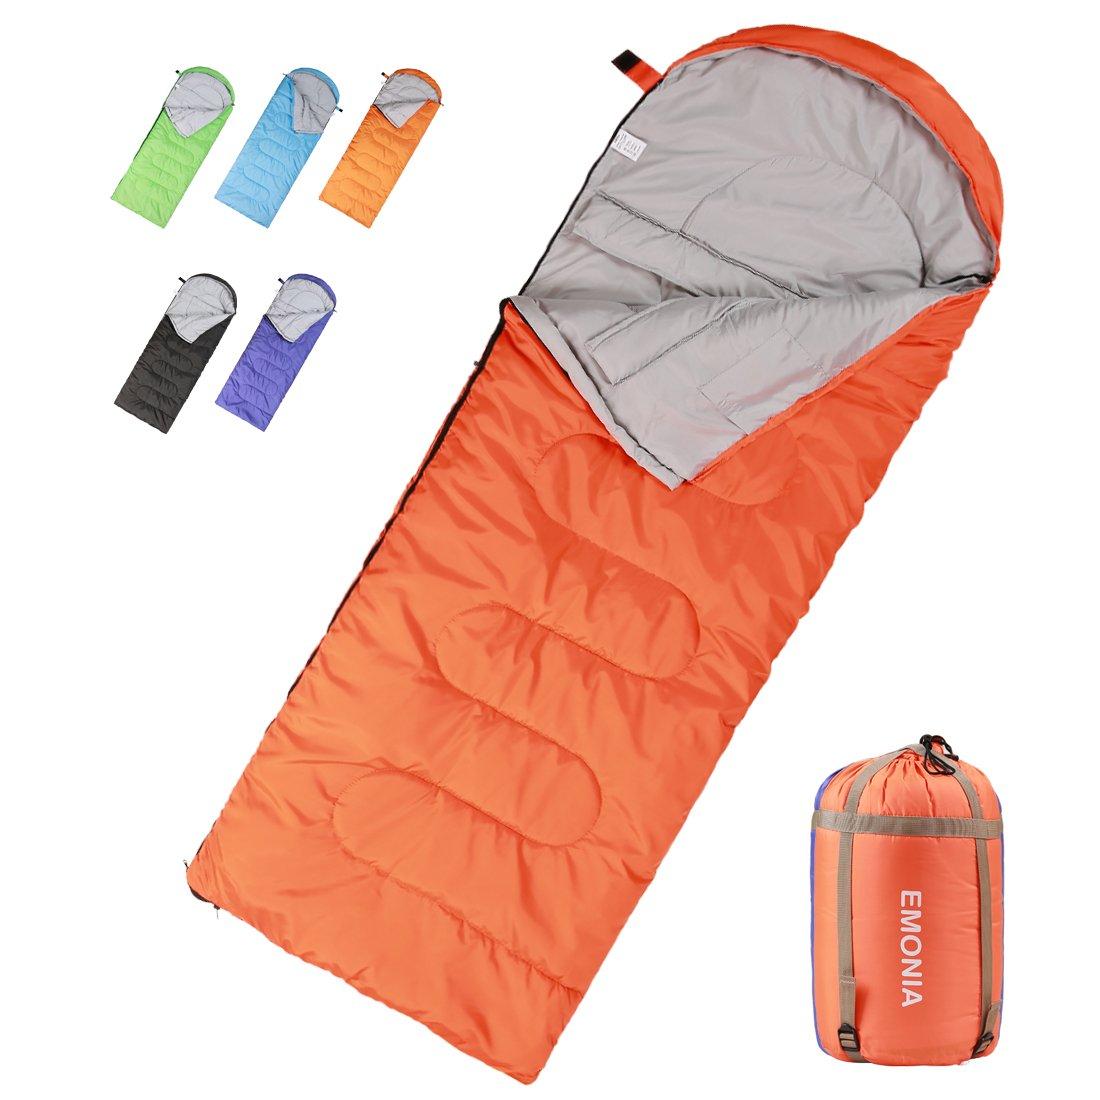 EMONIA Camping Sleeping Bag,3 Season Waterproof Outdoor Hiking Backpacking Sleeping Bag Perfect for Traveling,Lightweight Portable Envelope Sleeping Bags for Adults,Kids,Girls and Boys by EMONIA